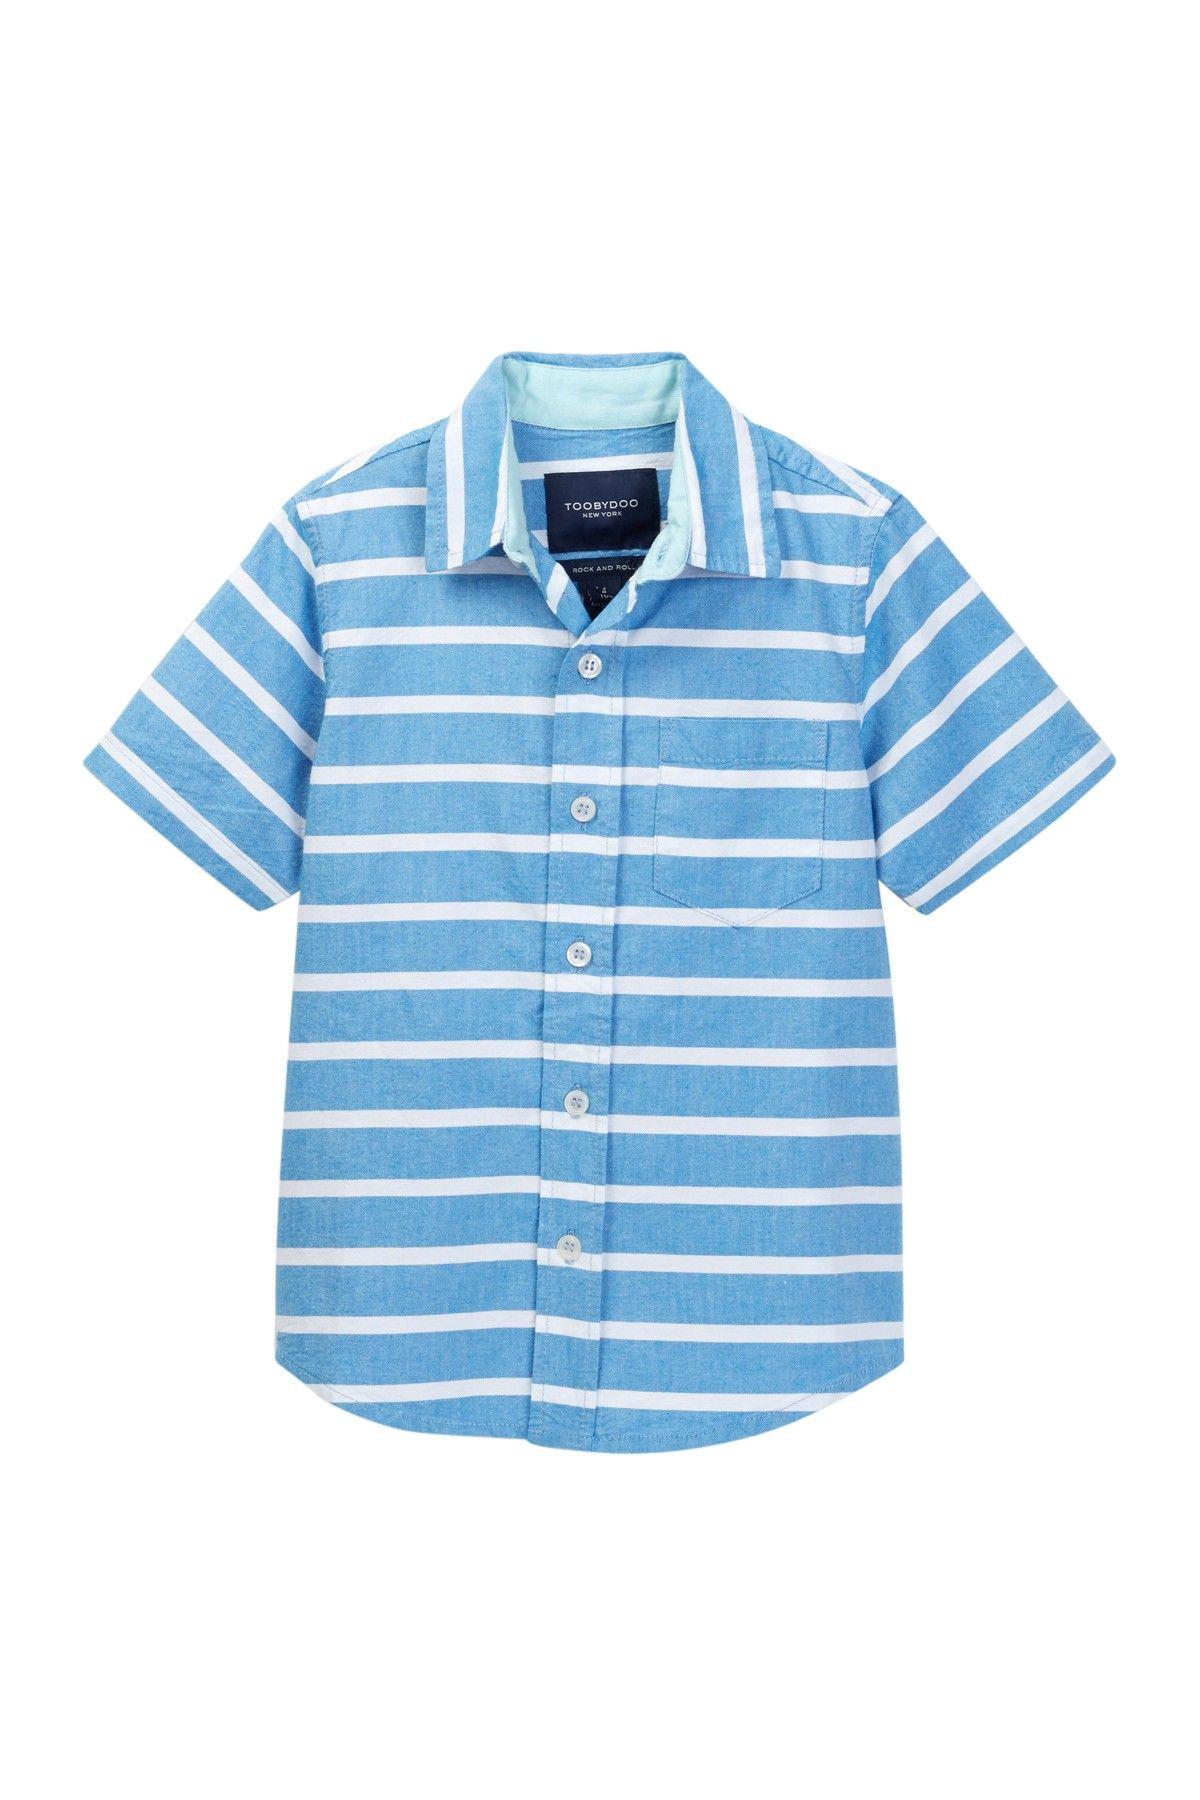 Roger Striped Short Sleeve Dress Shirt Toddler Little Boys Big